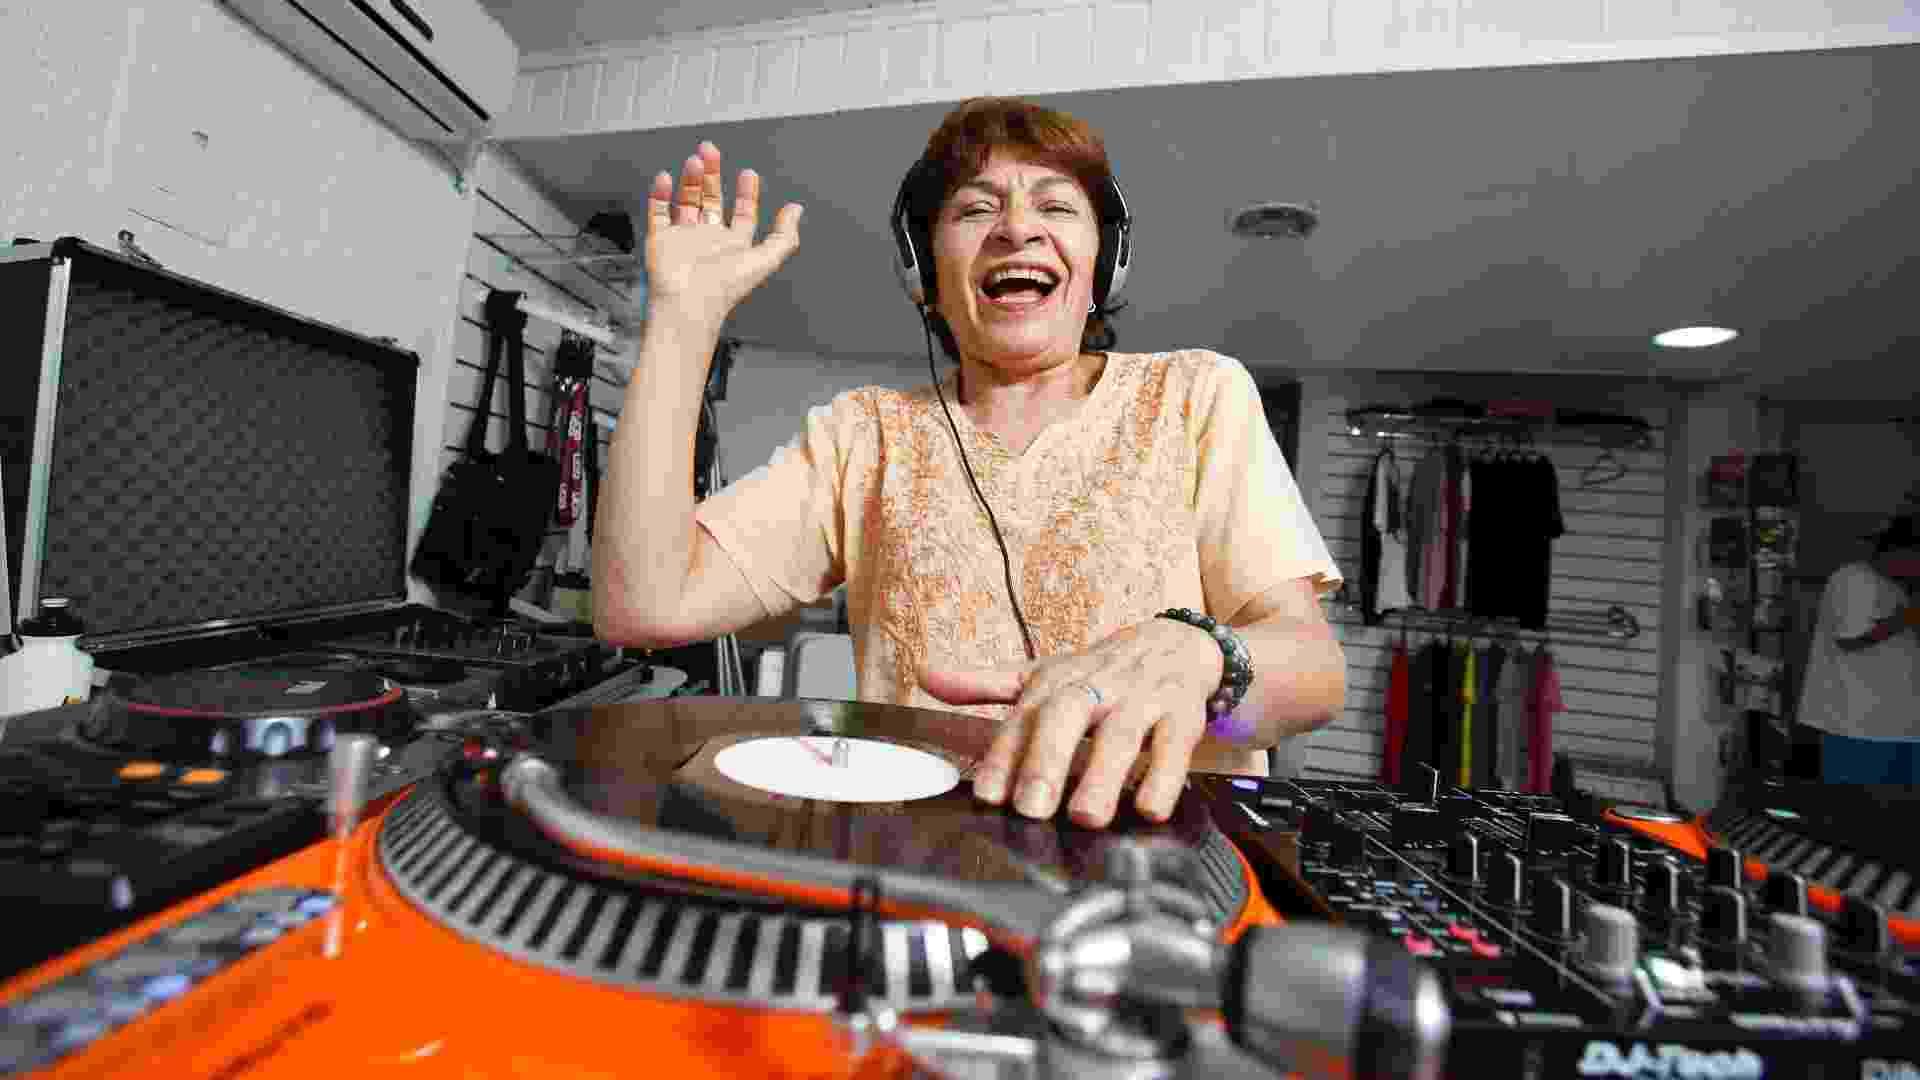 E-DJs, escola de DJ fundada pela empreendedora Lisa Bueno - Wanezza Soares/UOL